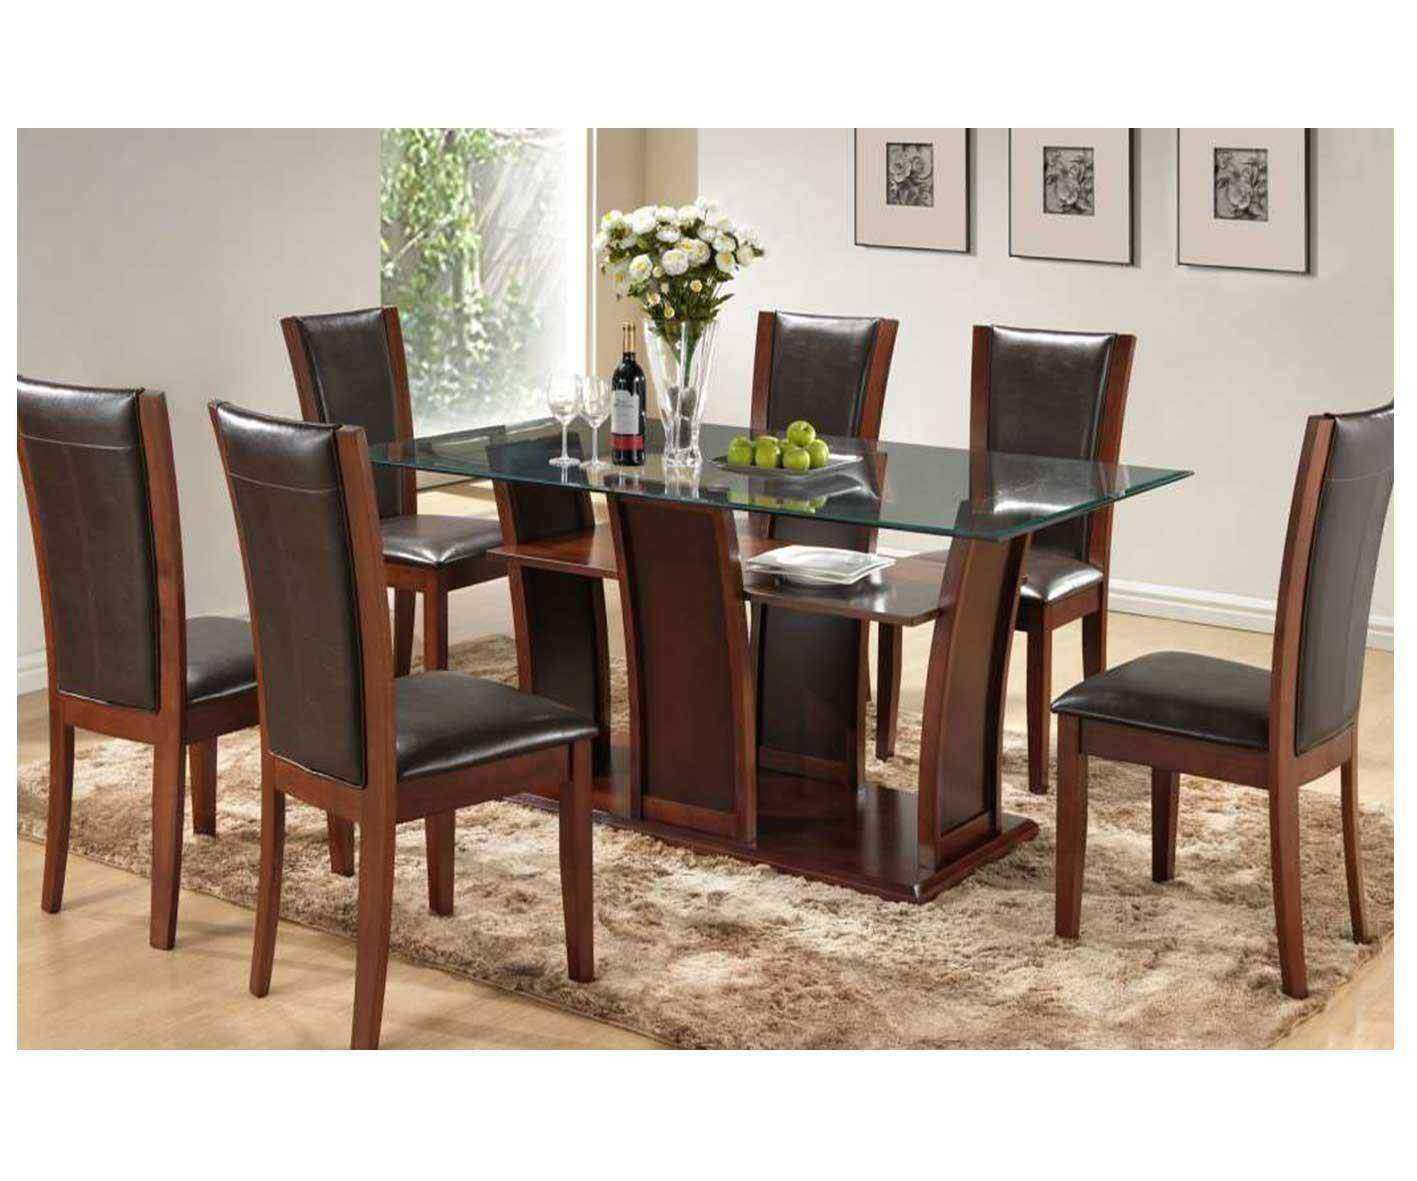 6 seat dining